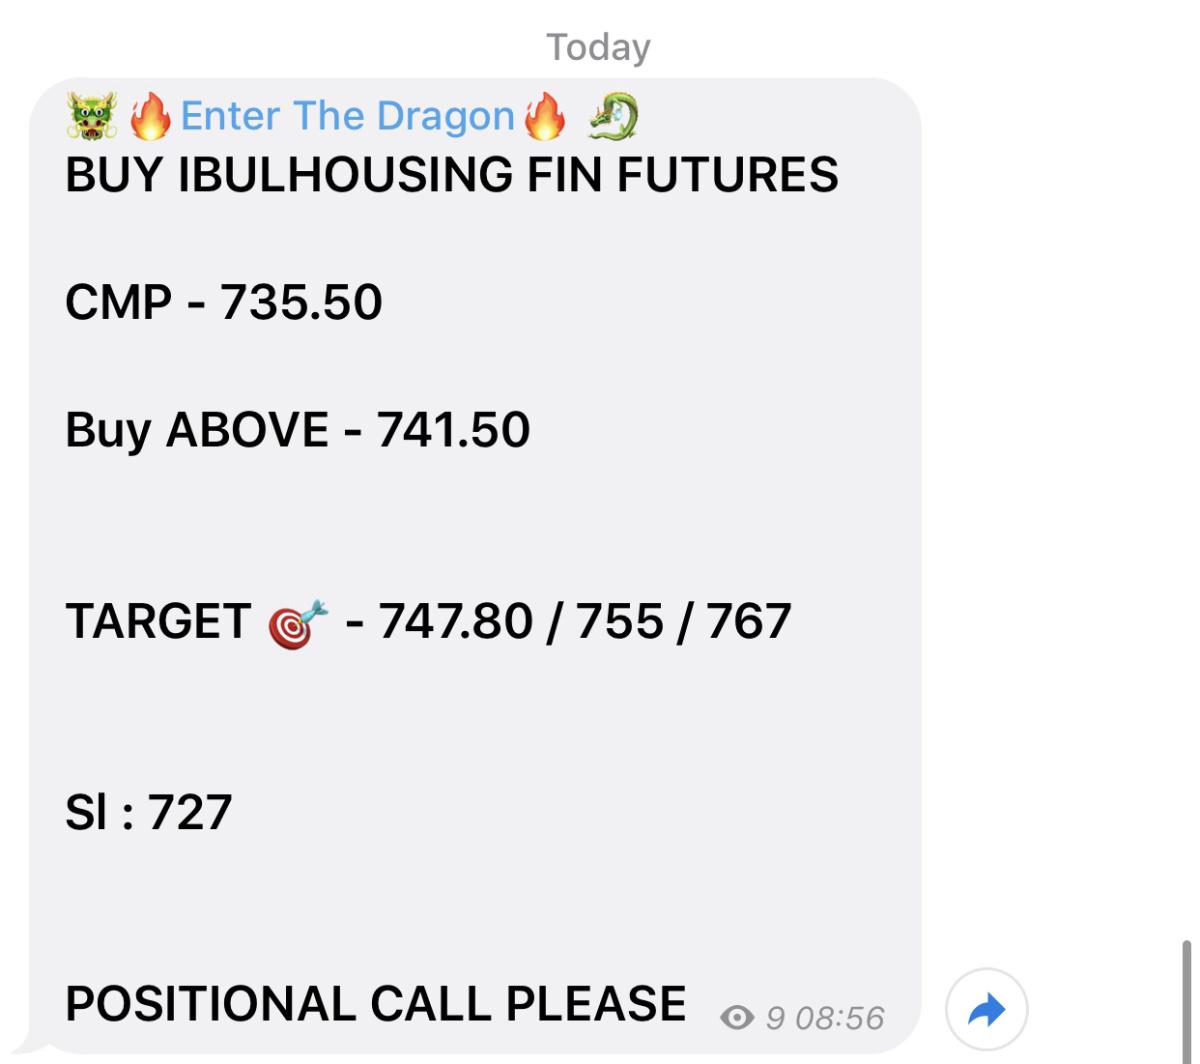 @dragons's activity - 118299